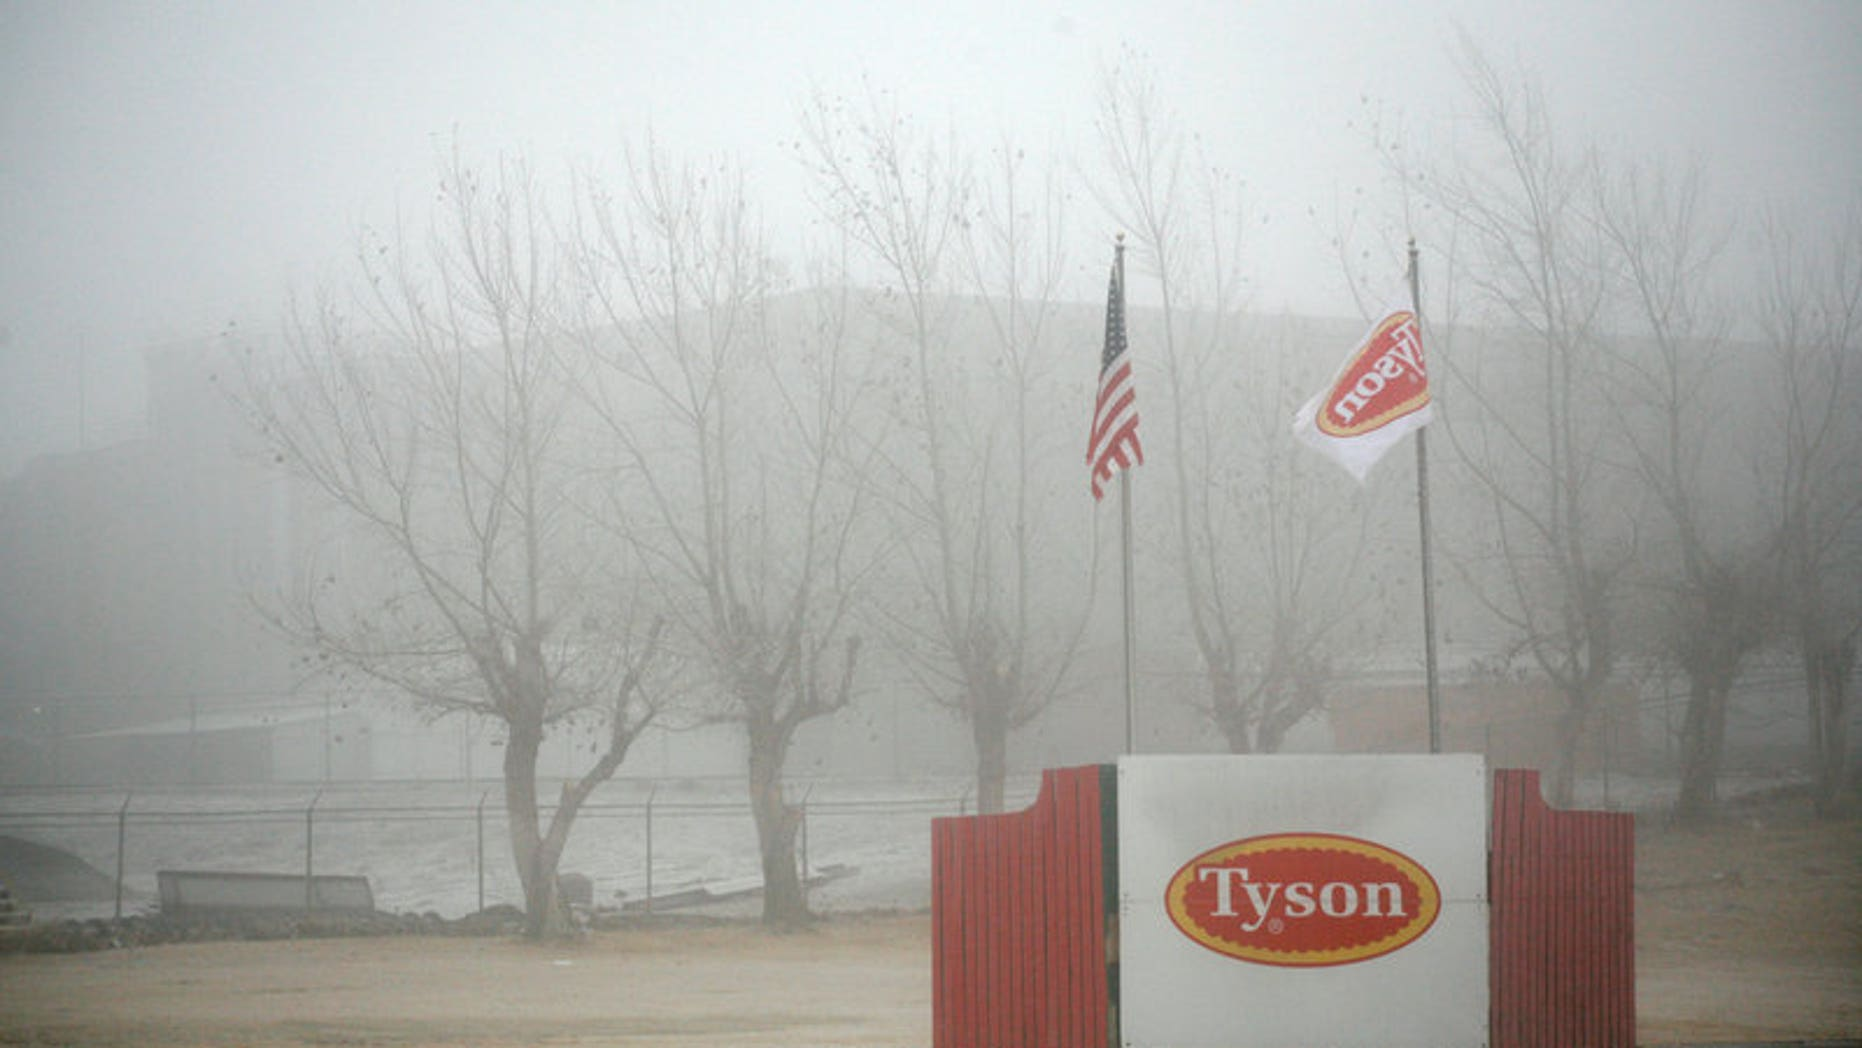 Fog shrouds the Tyson slaughterhouse in Burbank, Washington